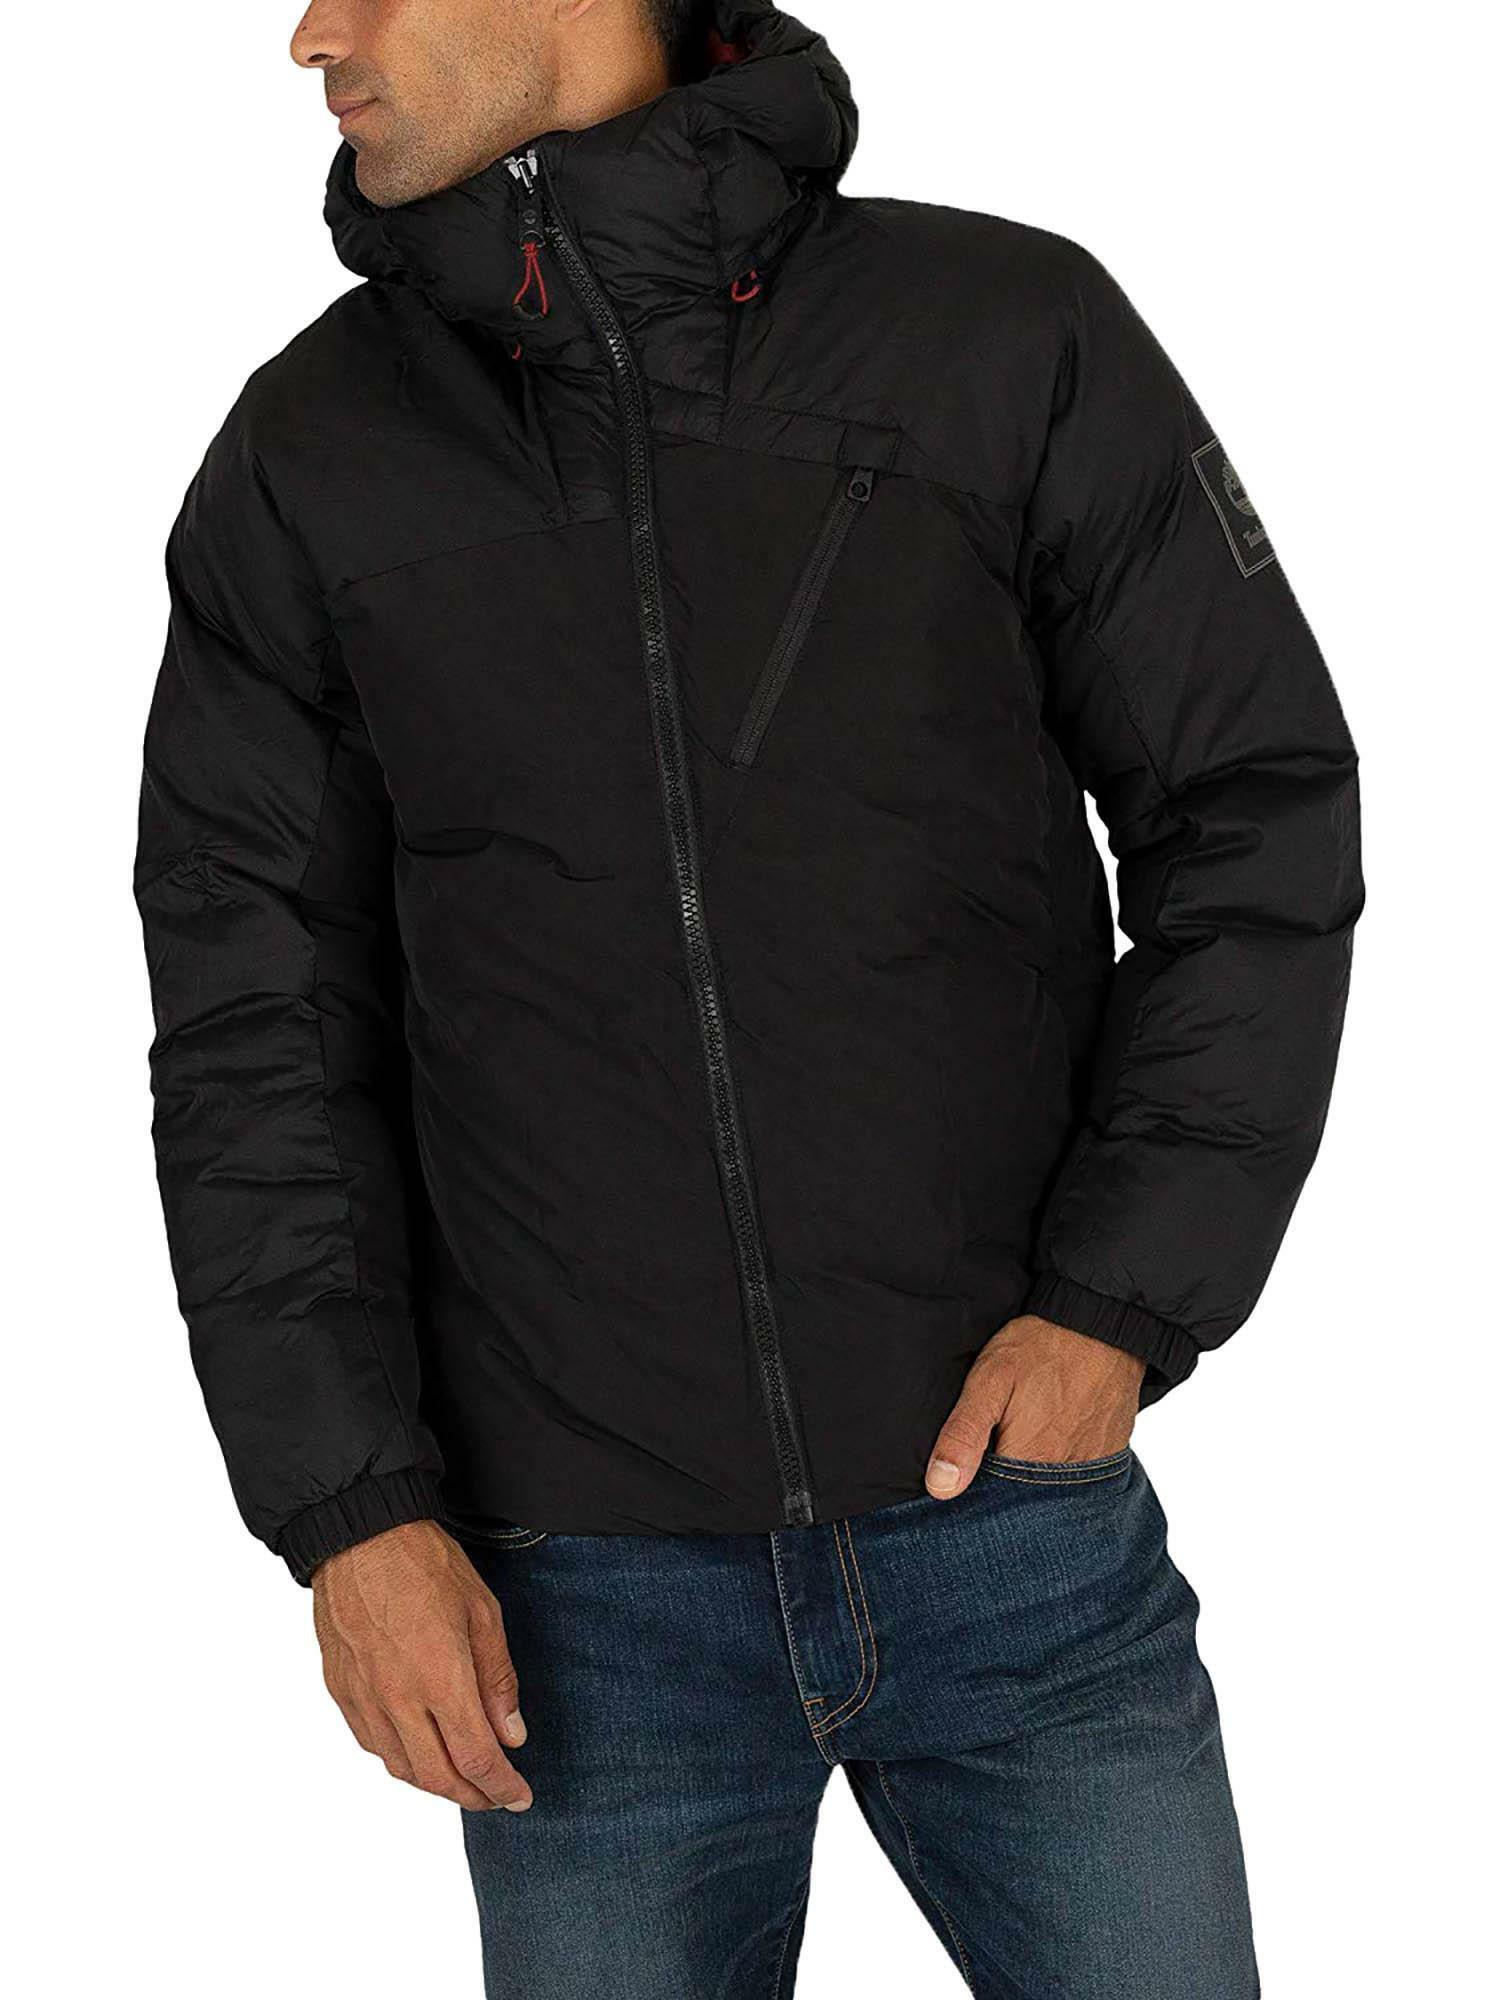 Timberland neo summit jck giubbotto uomo nero tb0a1x3q001